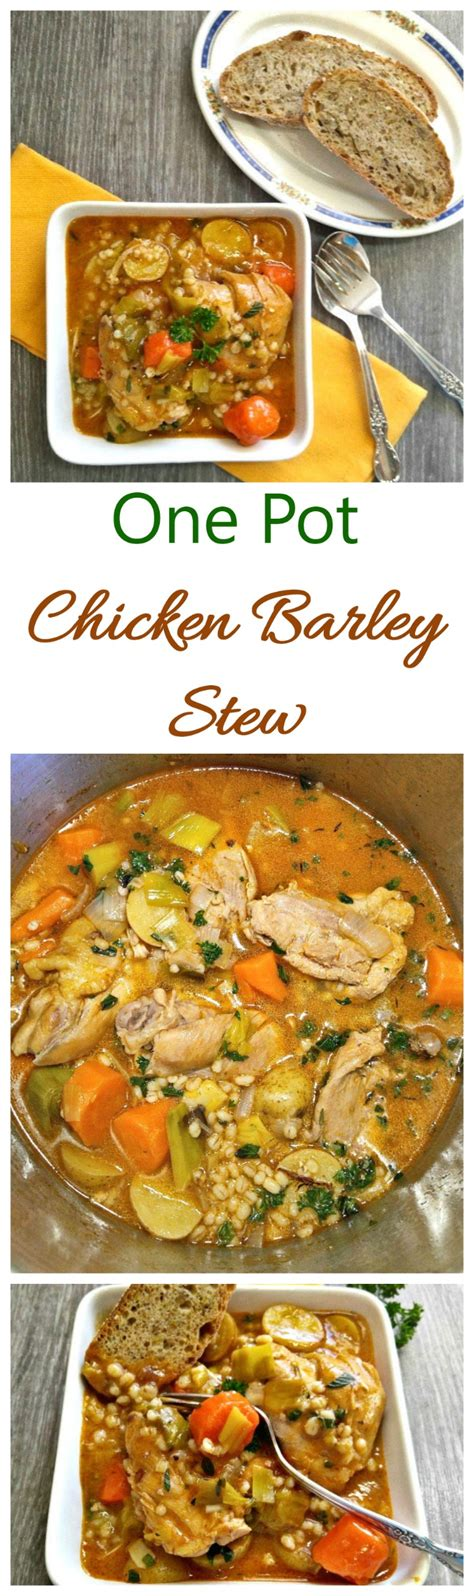 one pot comfort food one pot chicken barley stew hearty winter vegetable stew